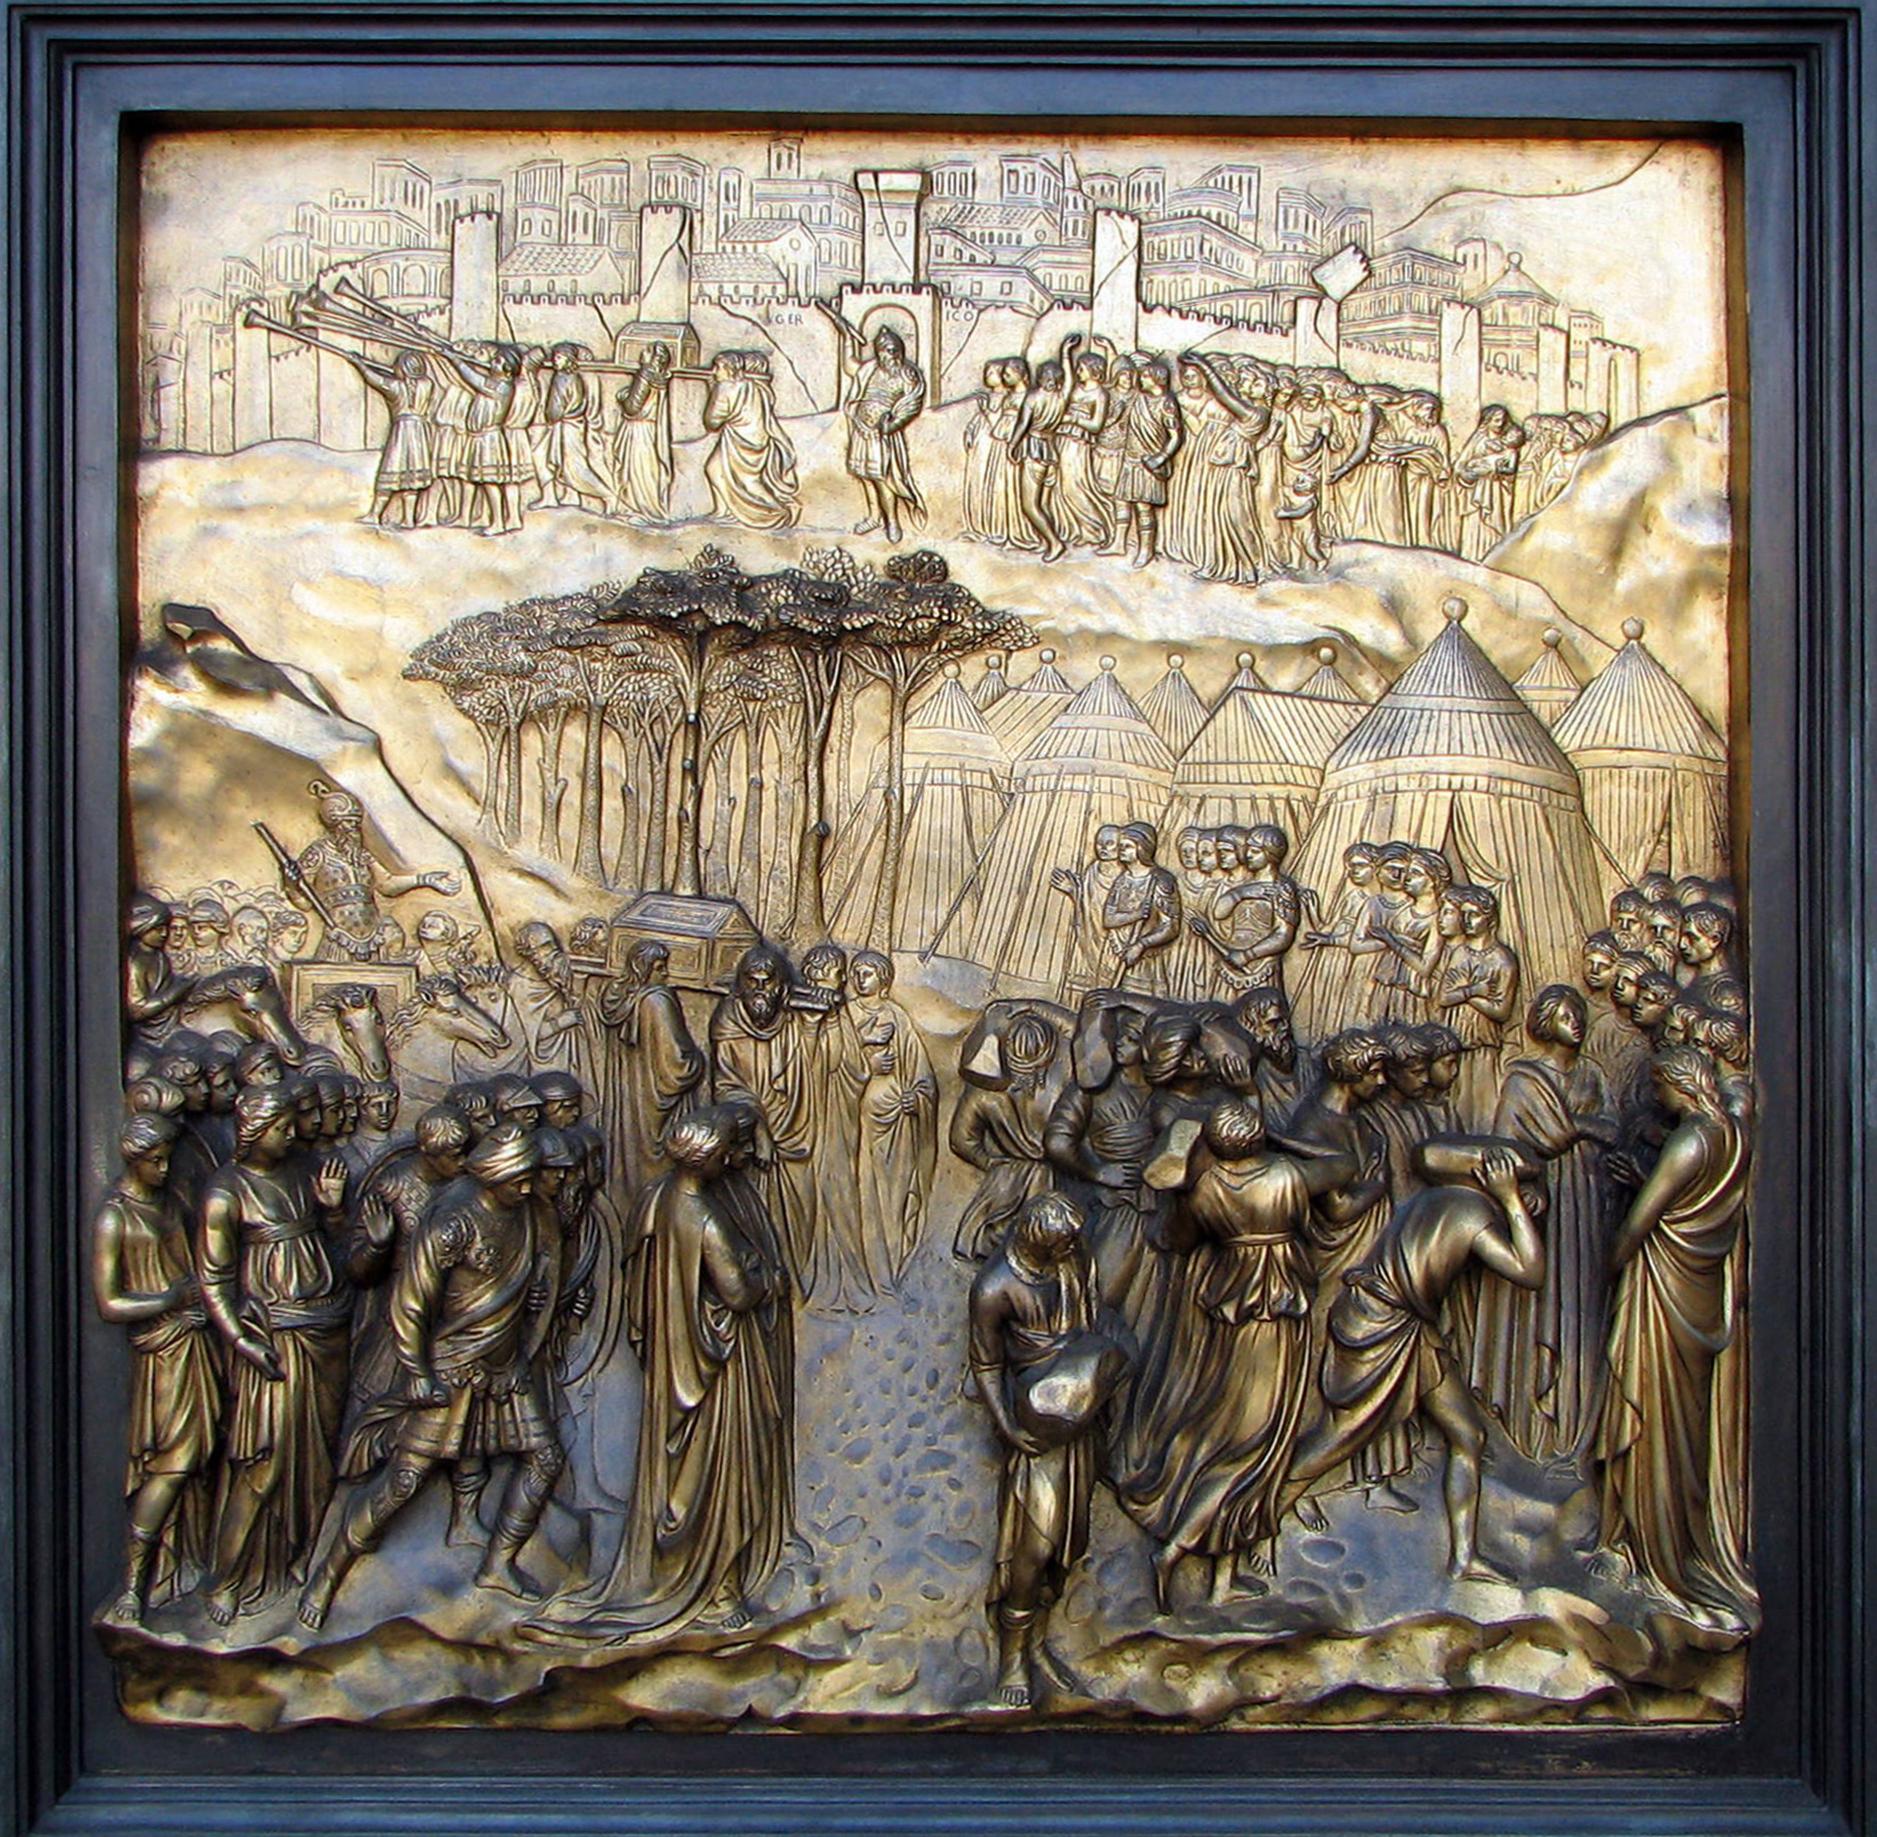 FileGrace Cathedral-Ghiberti doors detail.jpg & File:Grace Cathedral-Ghiberti doors detail.jpg - Wikimedia Commons